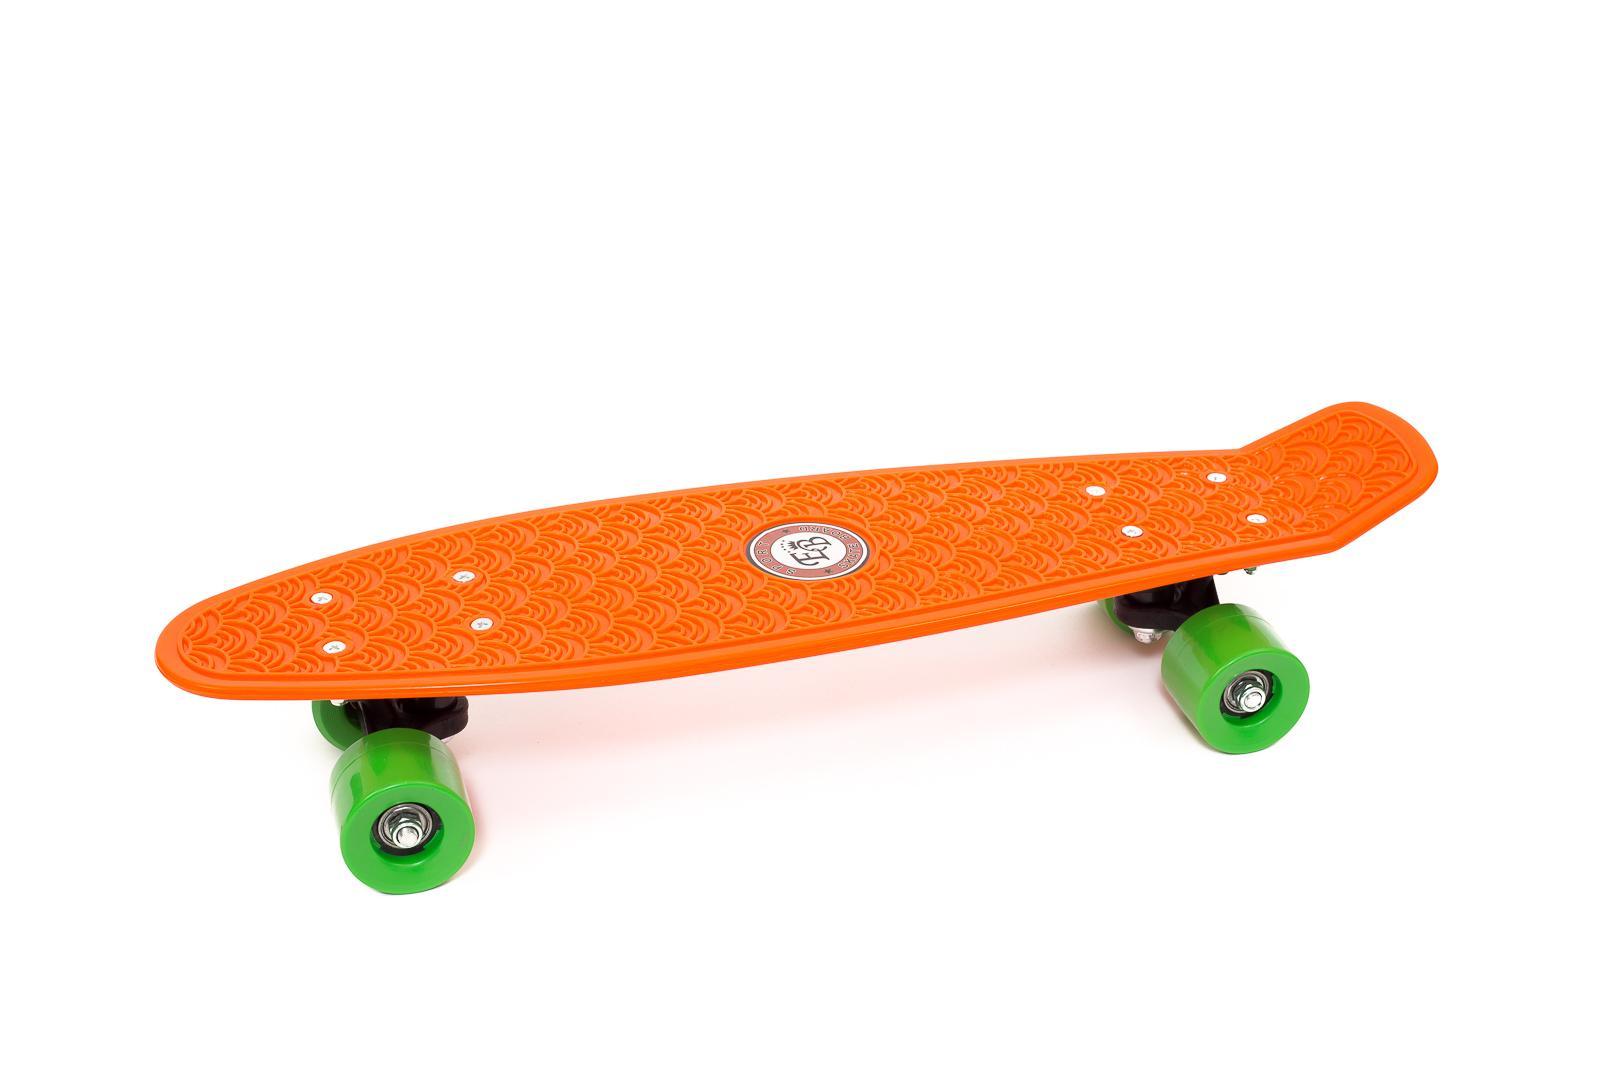 "Skateboard Penny Retro 22"" Standard Board Mini Street Cruiser Complete Orange"